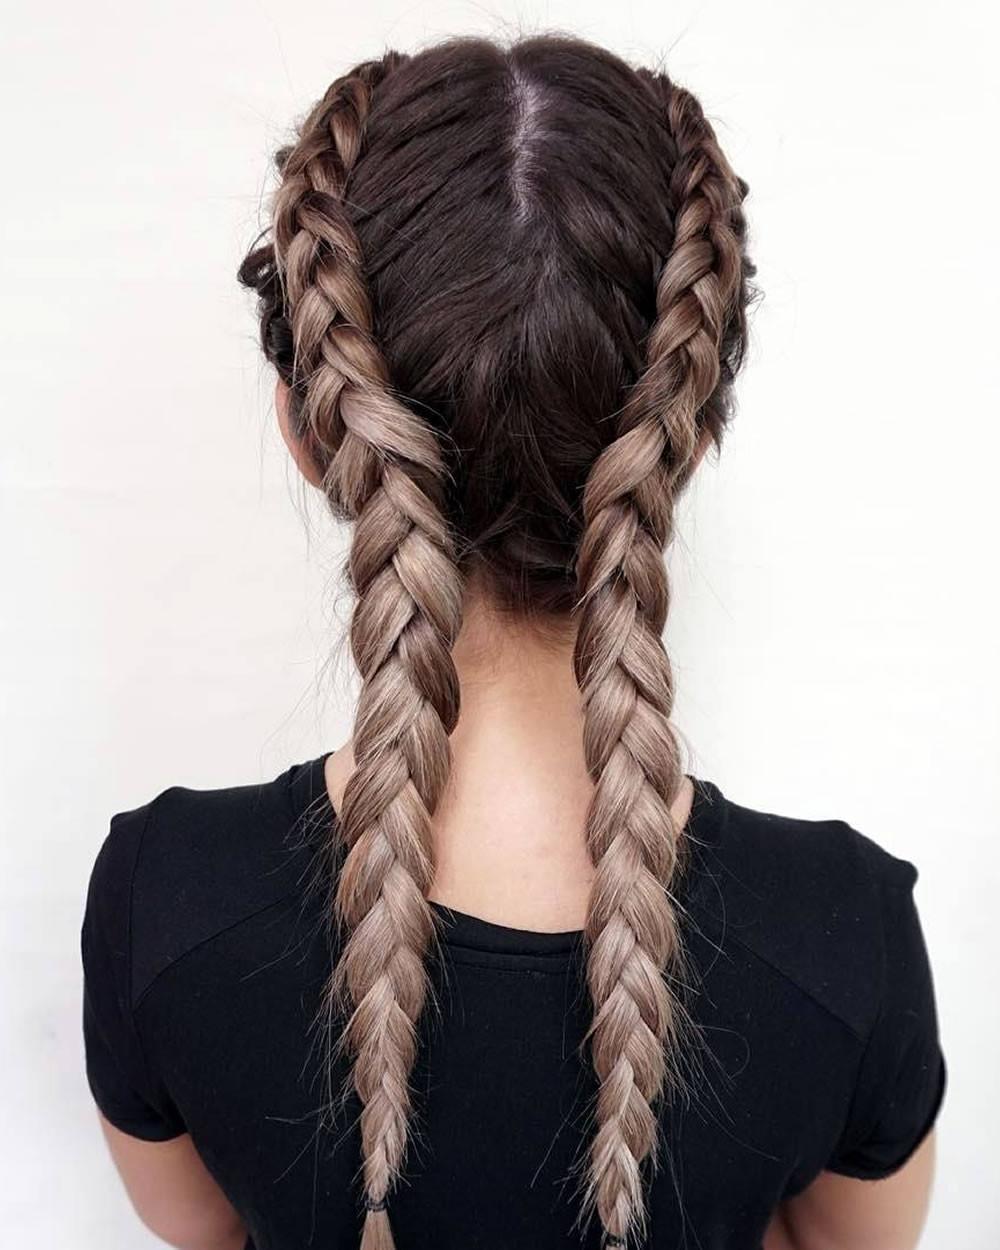 Long Hairstyles Braids  French Braids 2018 Mermaid Half up Side Fishtail etc